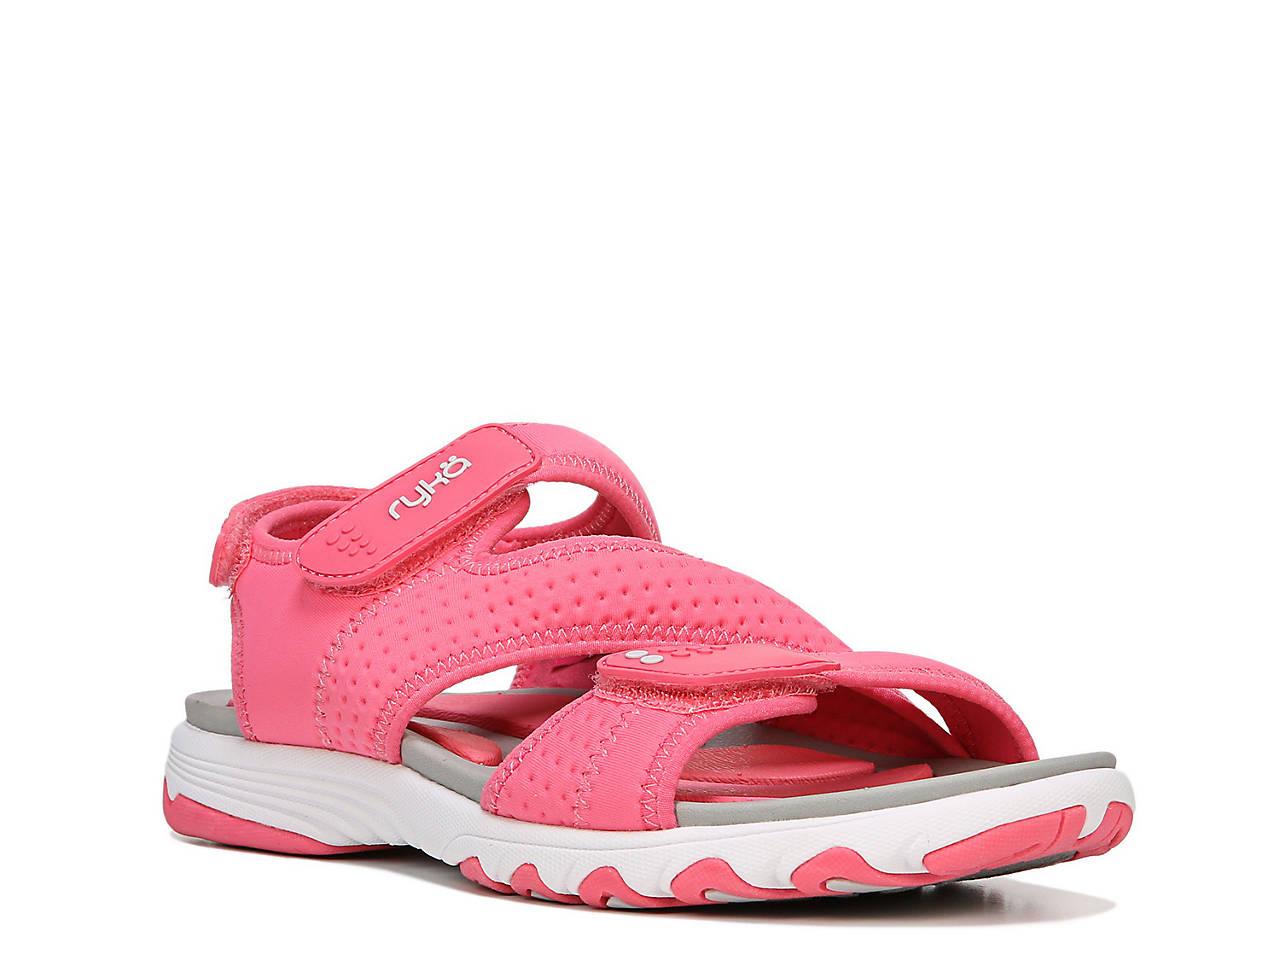 Ryka Dominica Women's Sandals free shipping purchase XqgWZV